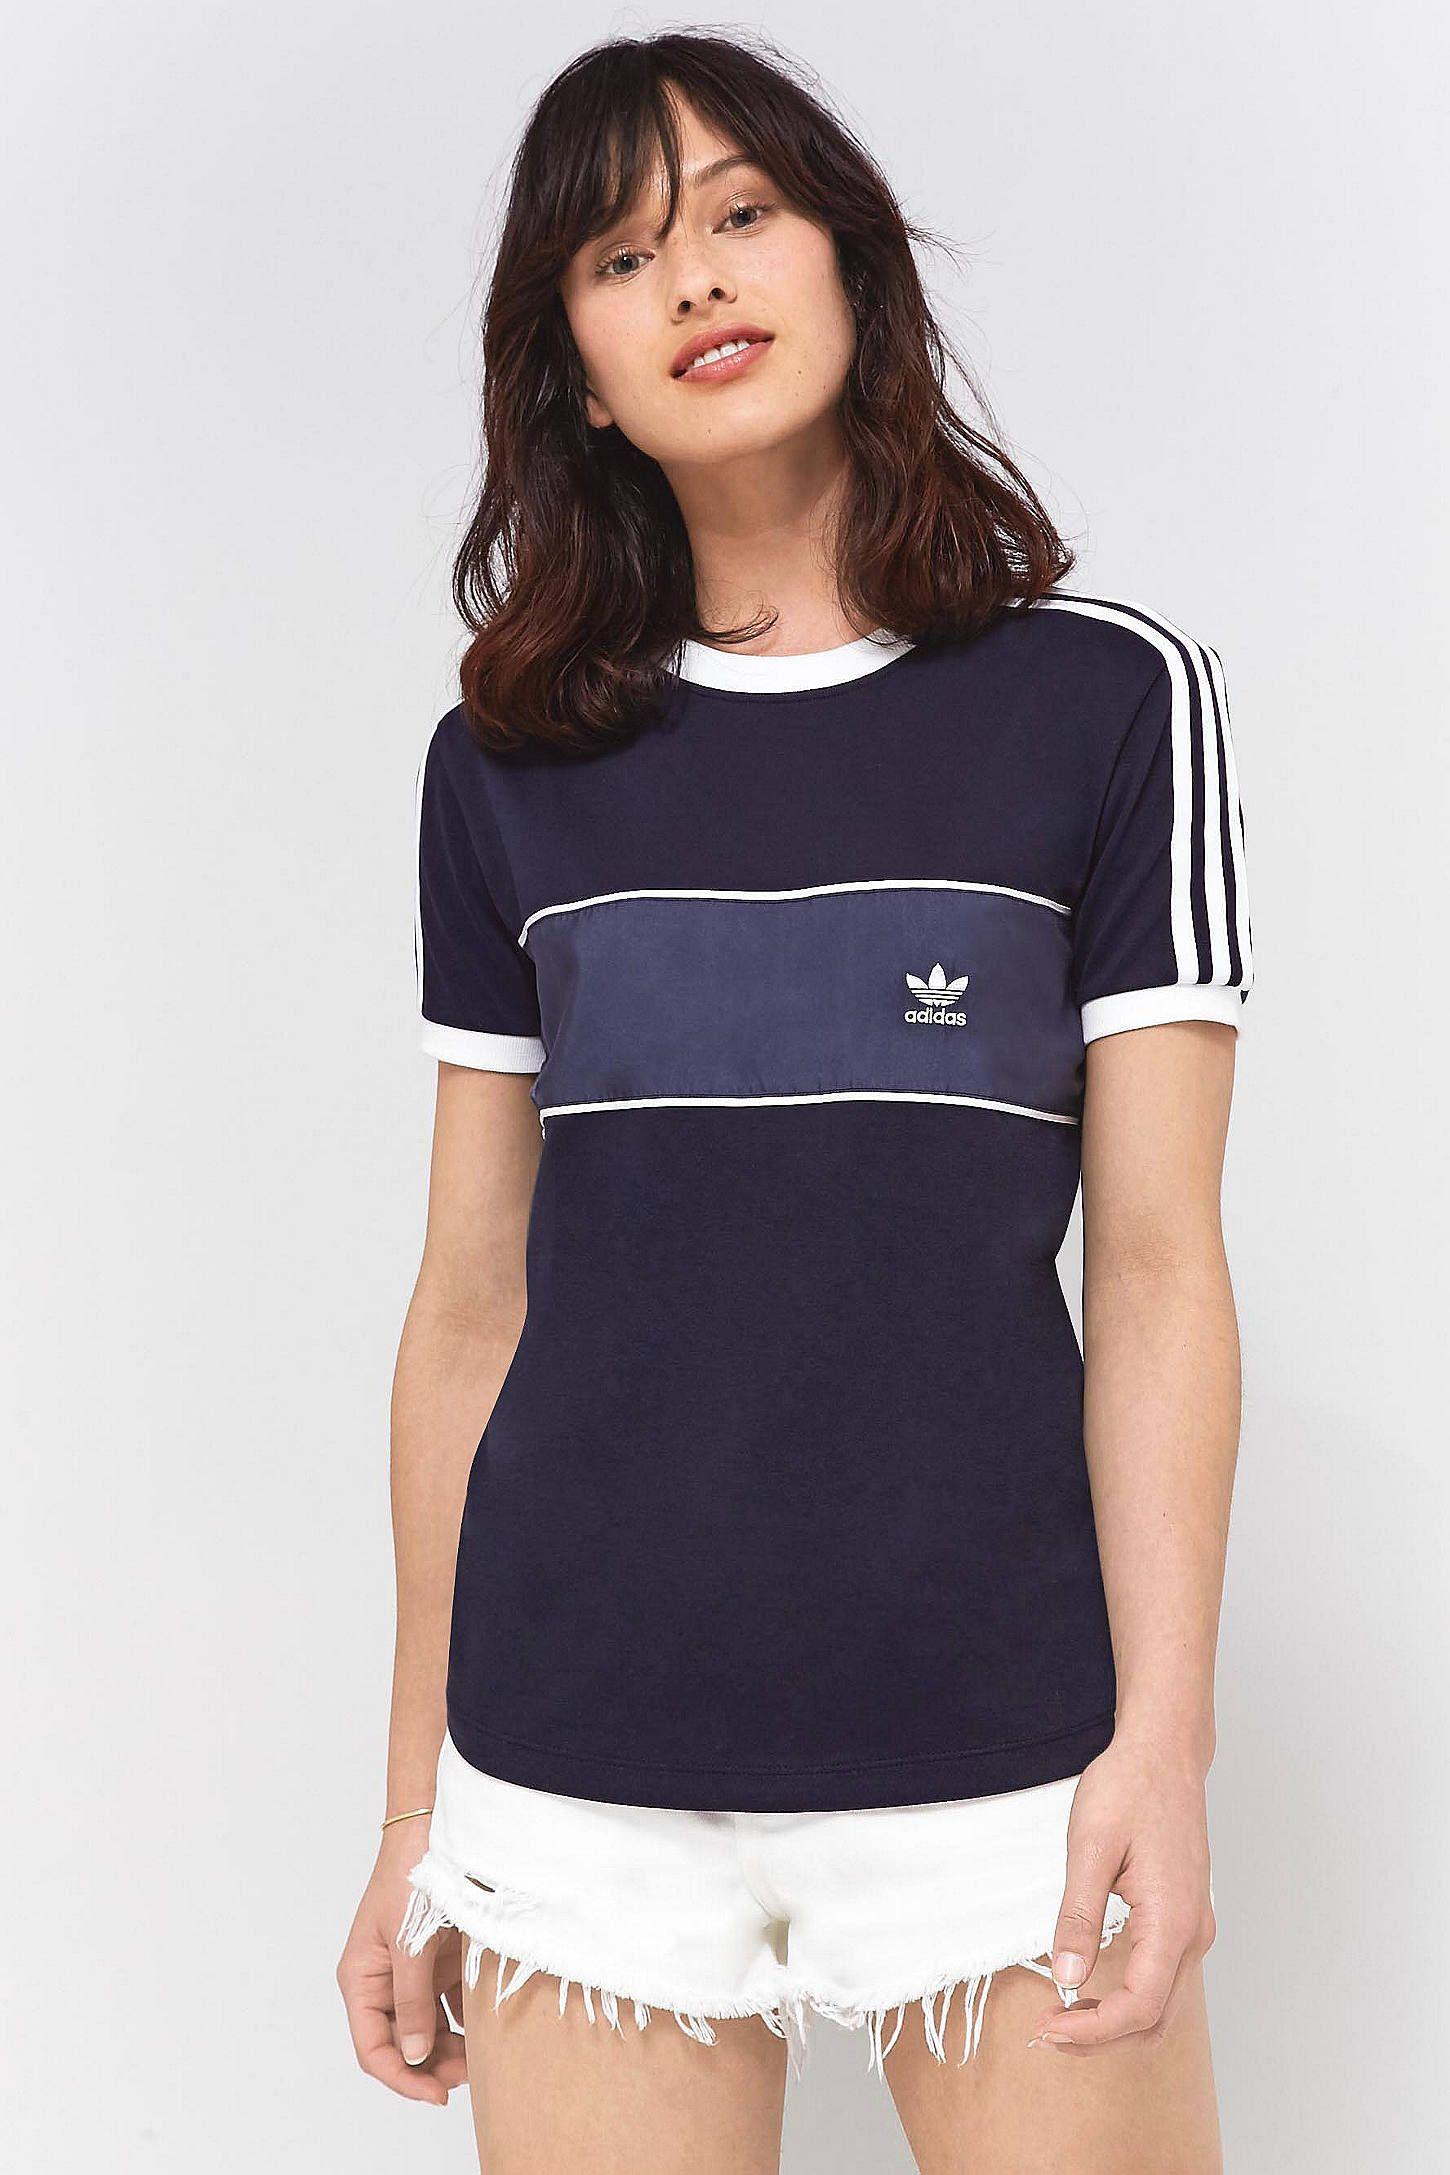 adidas Originals 3 Stripe Paneled Navy T Shirt | Adidas